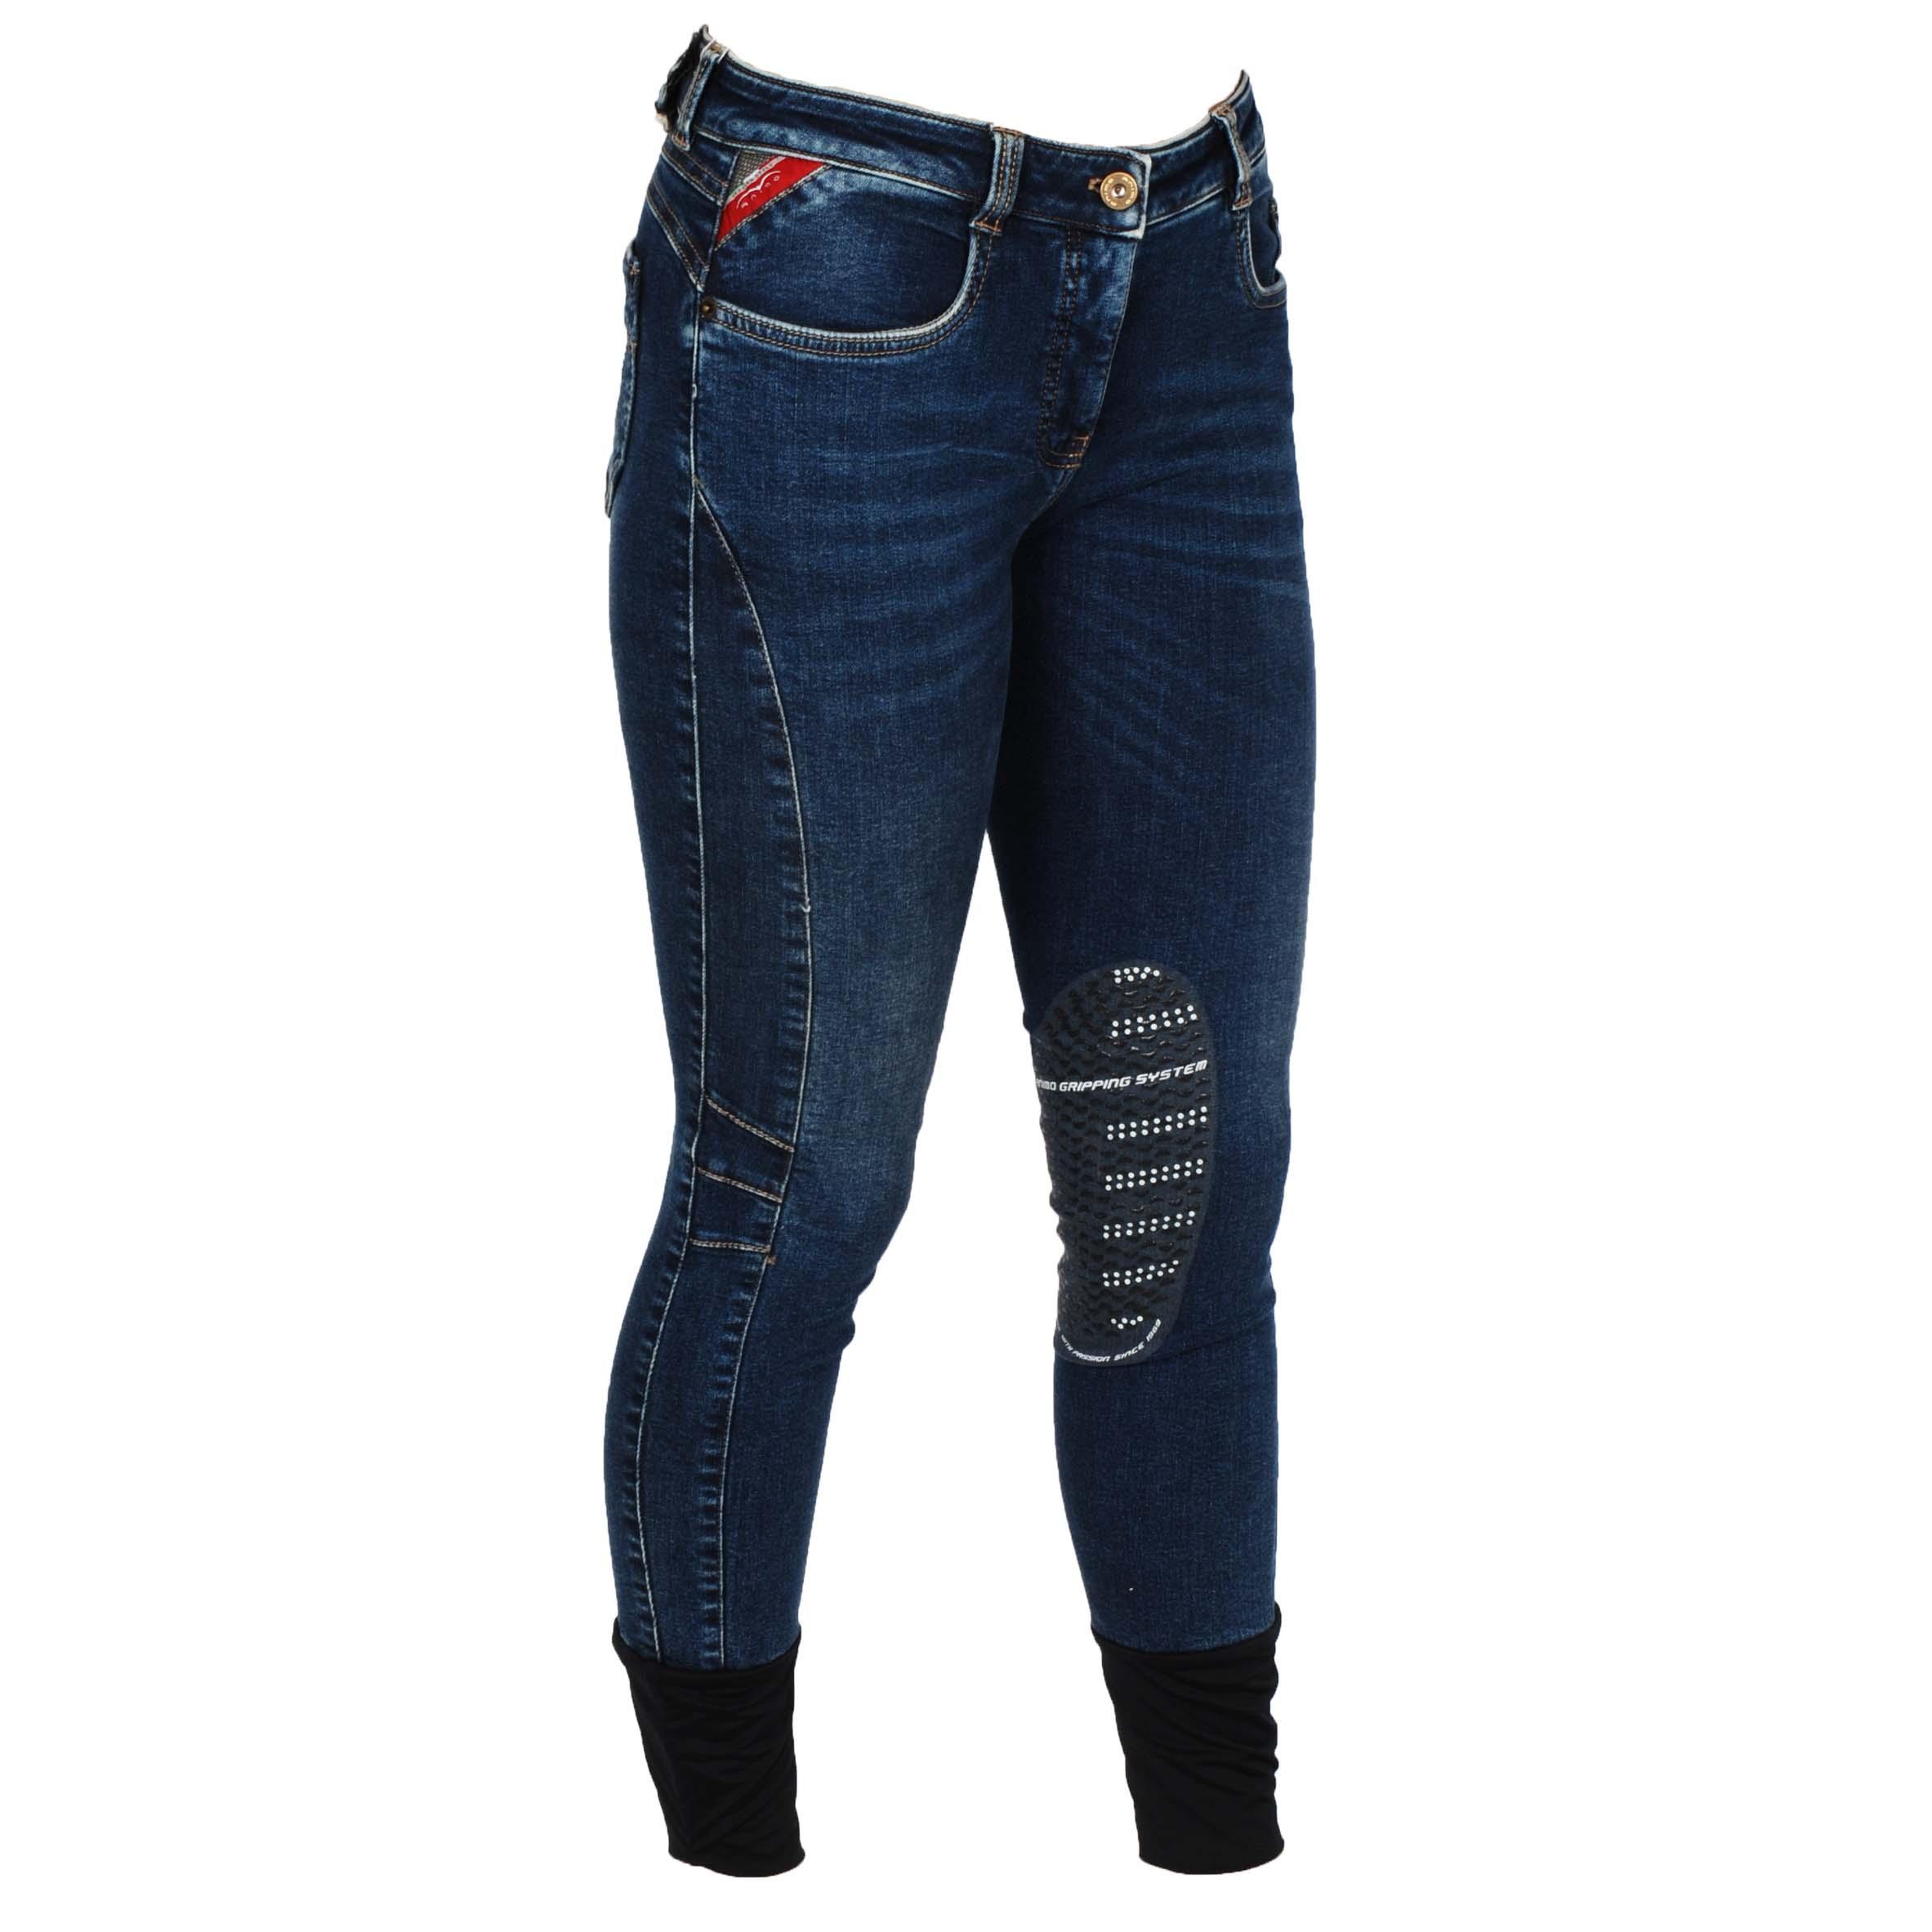 Animo Novema rijbroek jeans maat:38